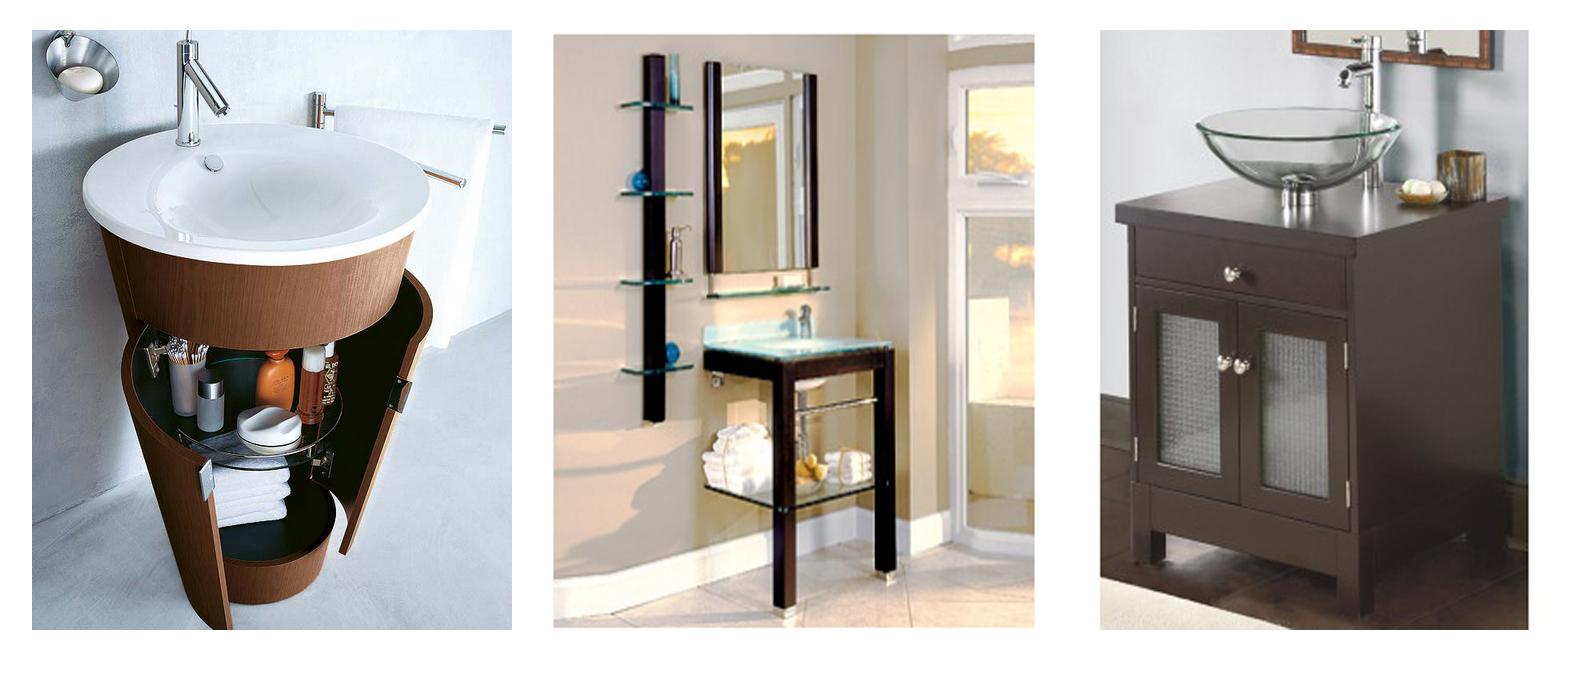 double vanity ideas for small bathrooms vanity ideas for small bathrooms new in inspiring remarkable master MBWETJU